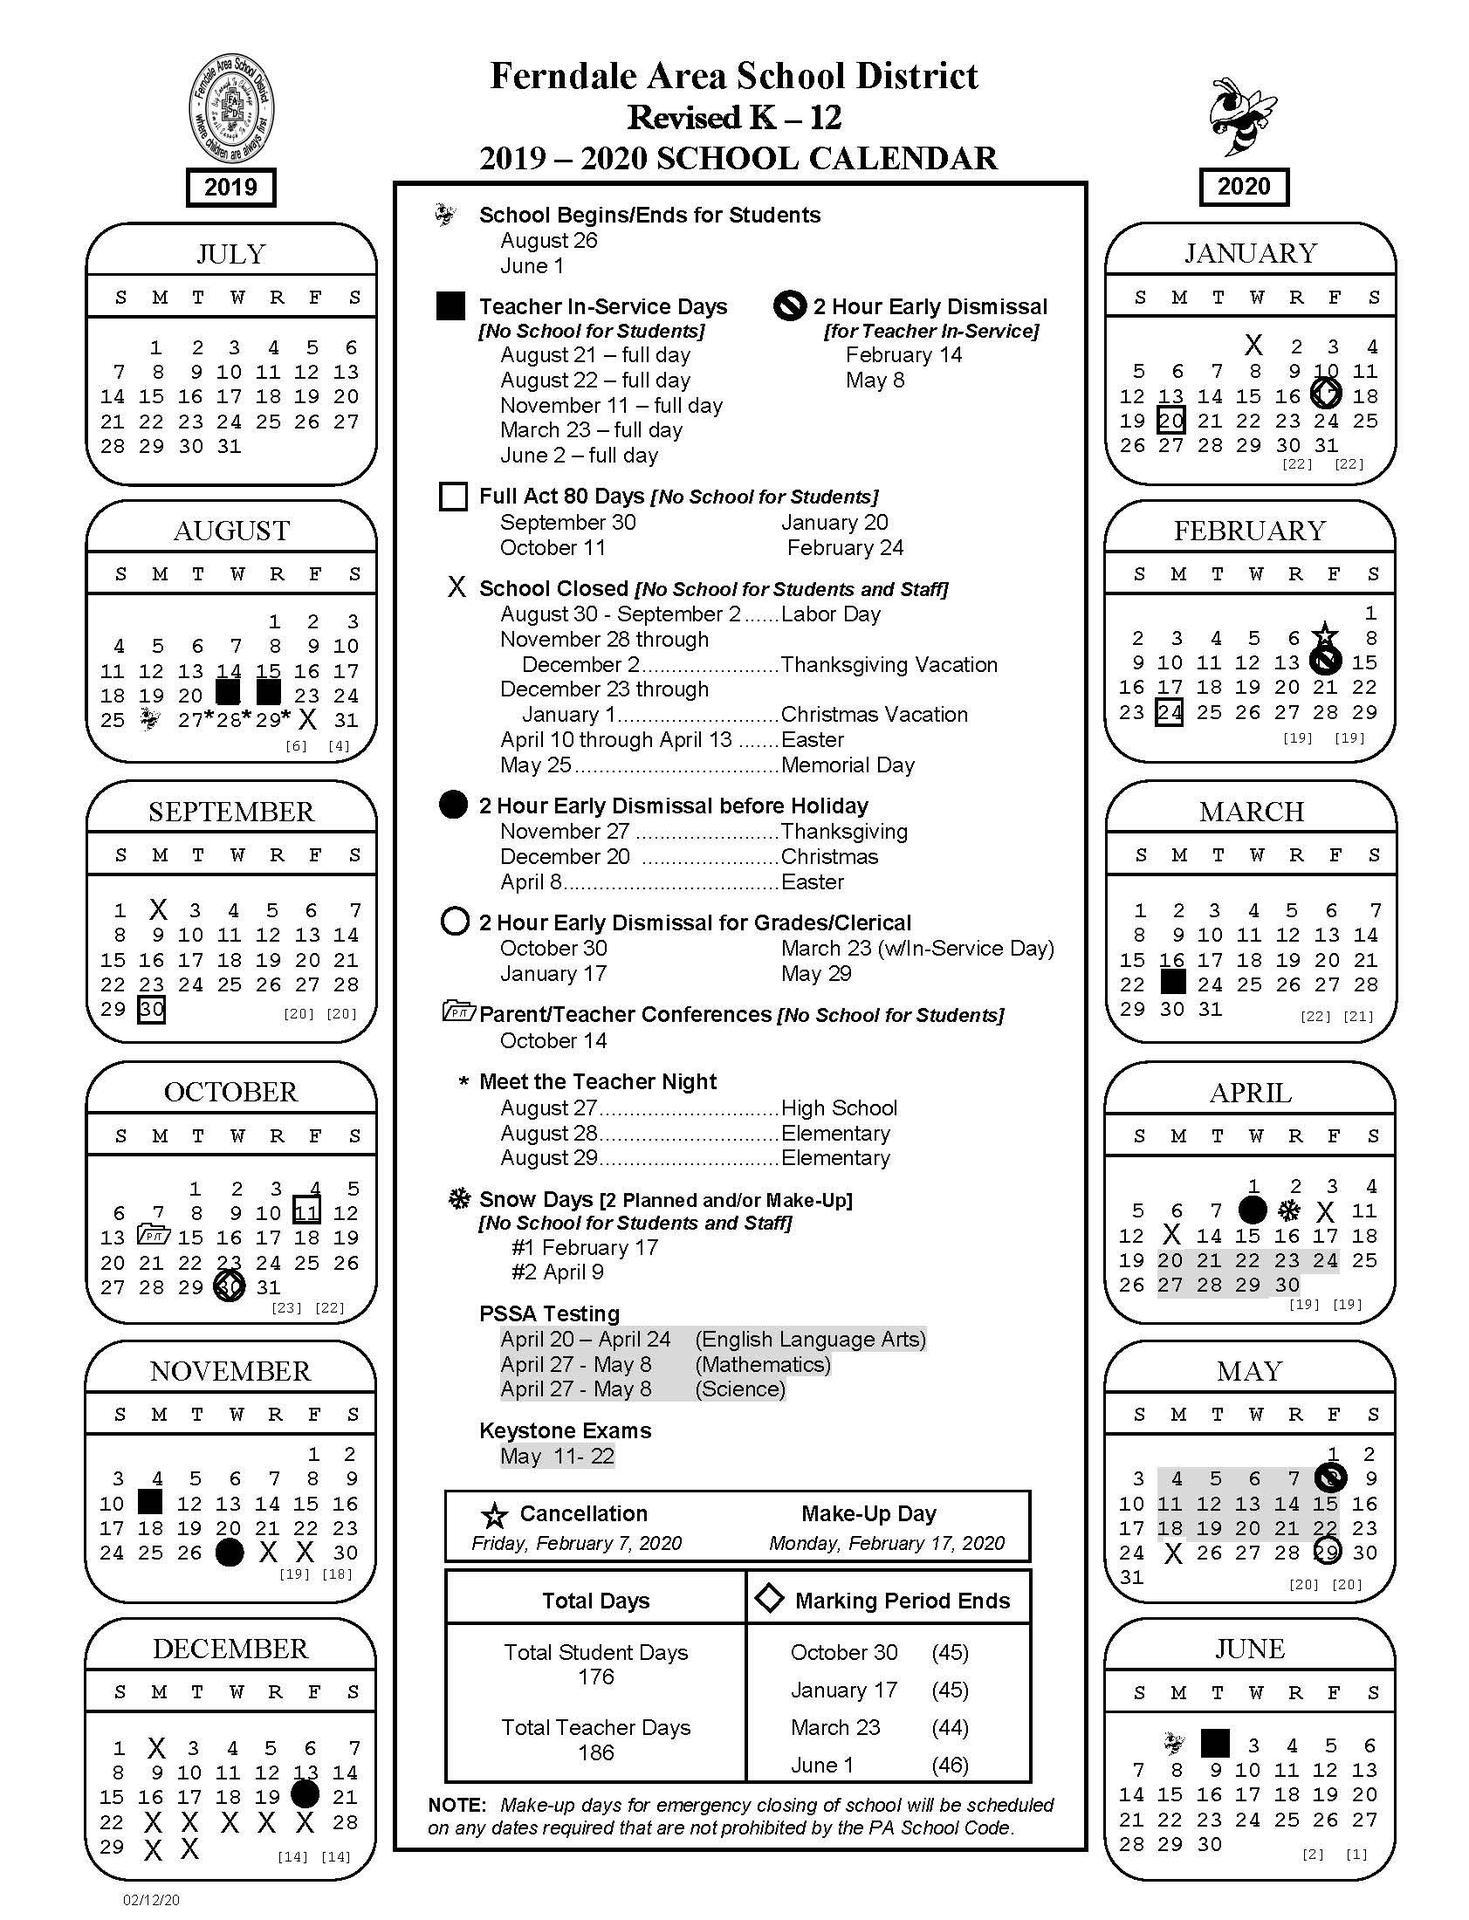 2019-2020 Revised K-12 School Calendar